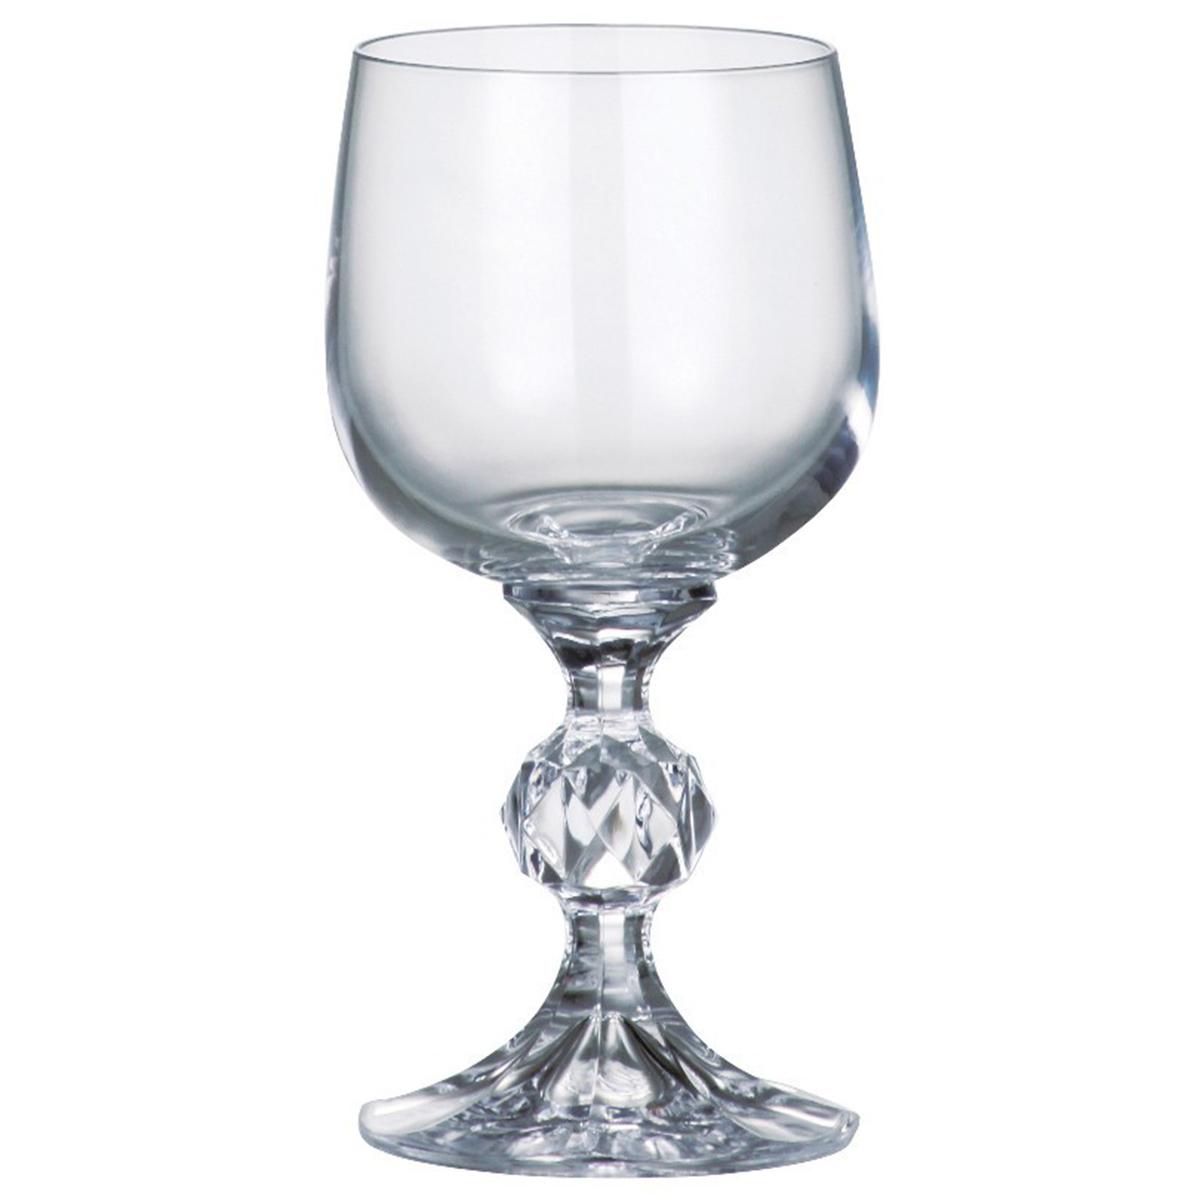 Набор бокалов для вина Bohemia Crystal Клаудия, 230 мл, 6 шт. 40149/230 набор бокалов для вина bohemia crystal анжела 185 мл 6 шт page 3